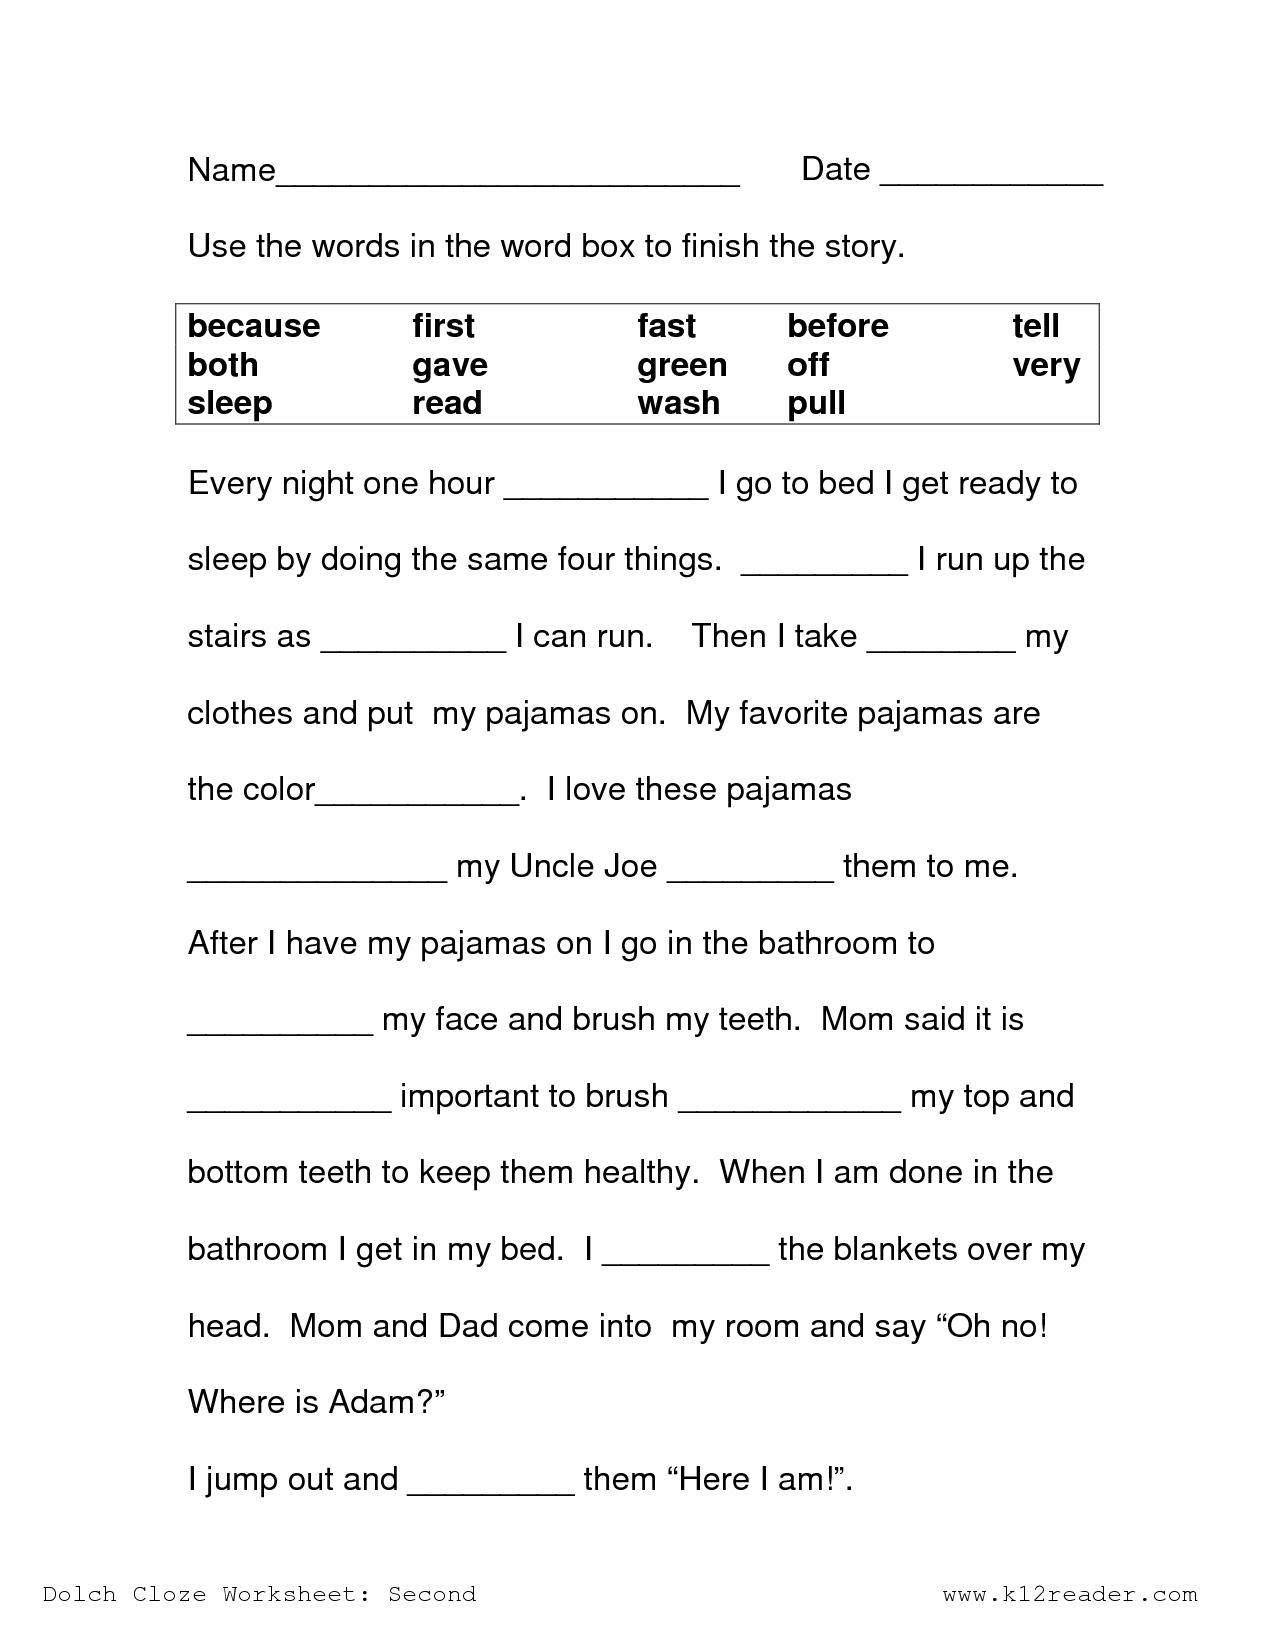 Math Worksheet: 2Nd Grade Science Worksheets Free Printable Easy - Printable Crossword Puzzles 2Nd Grade